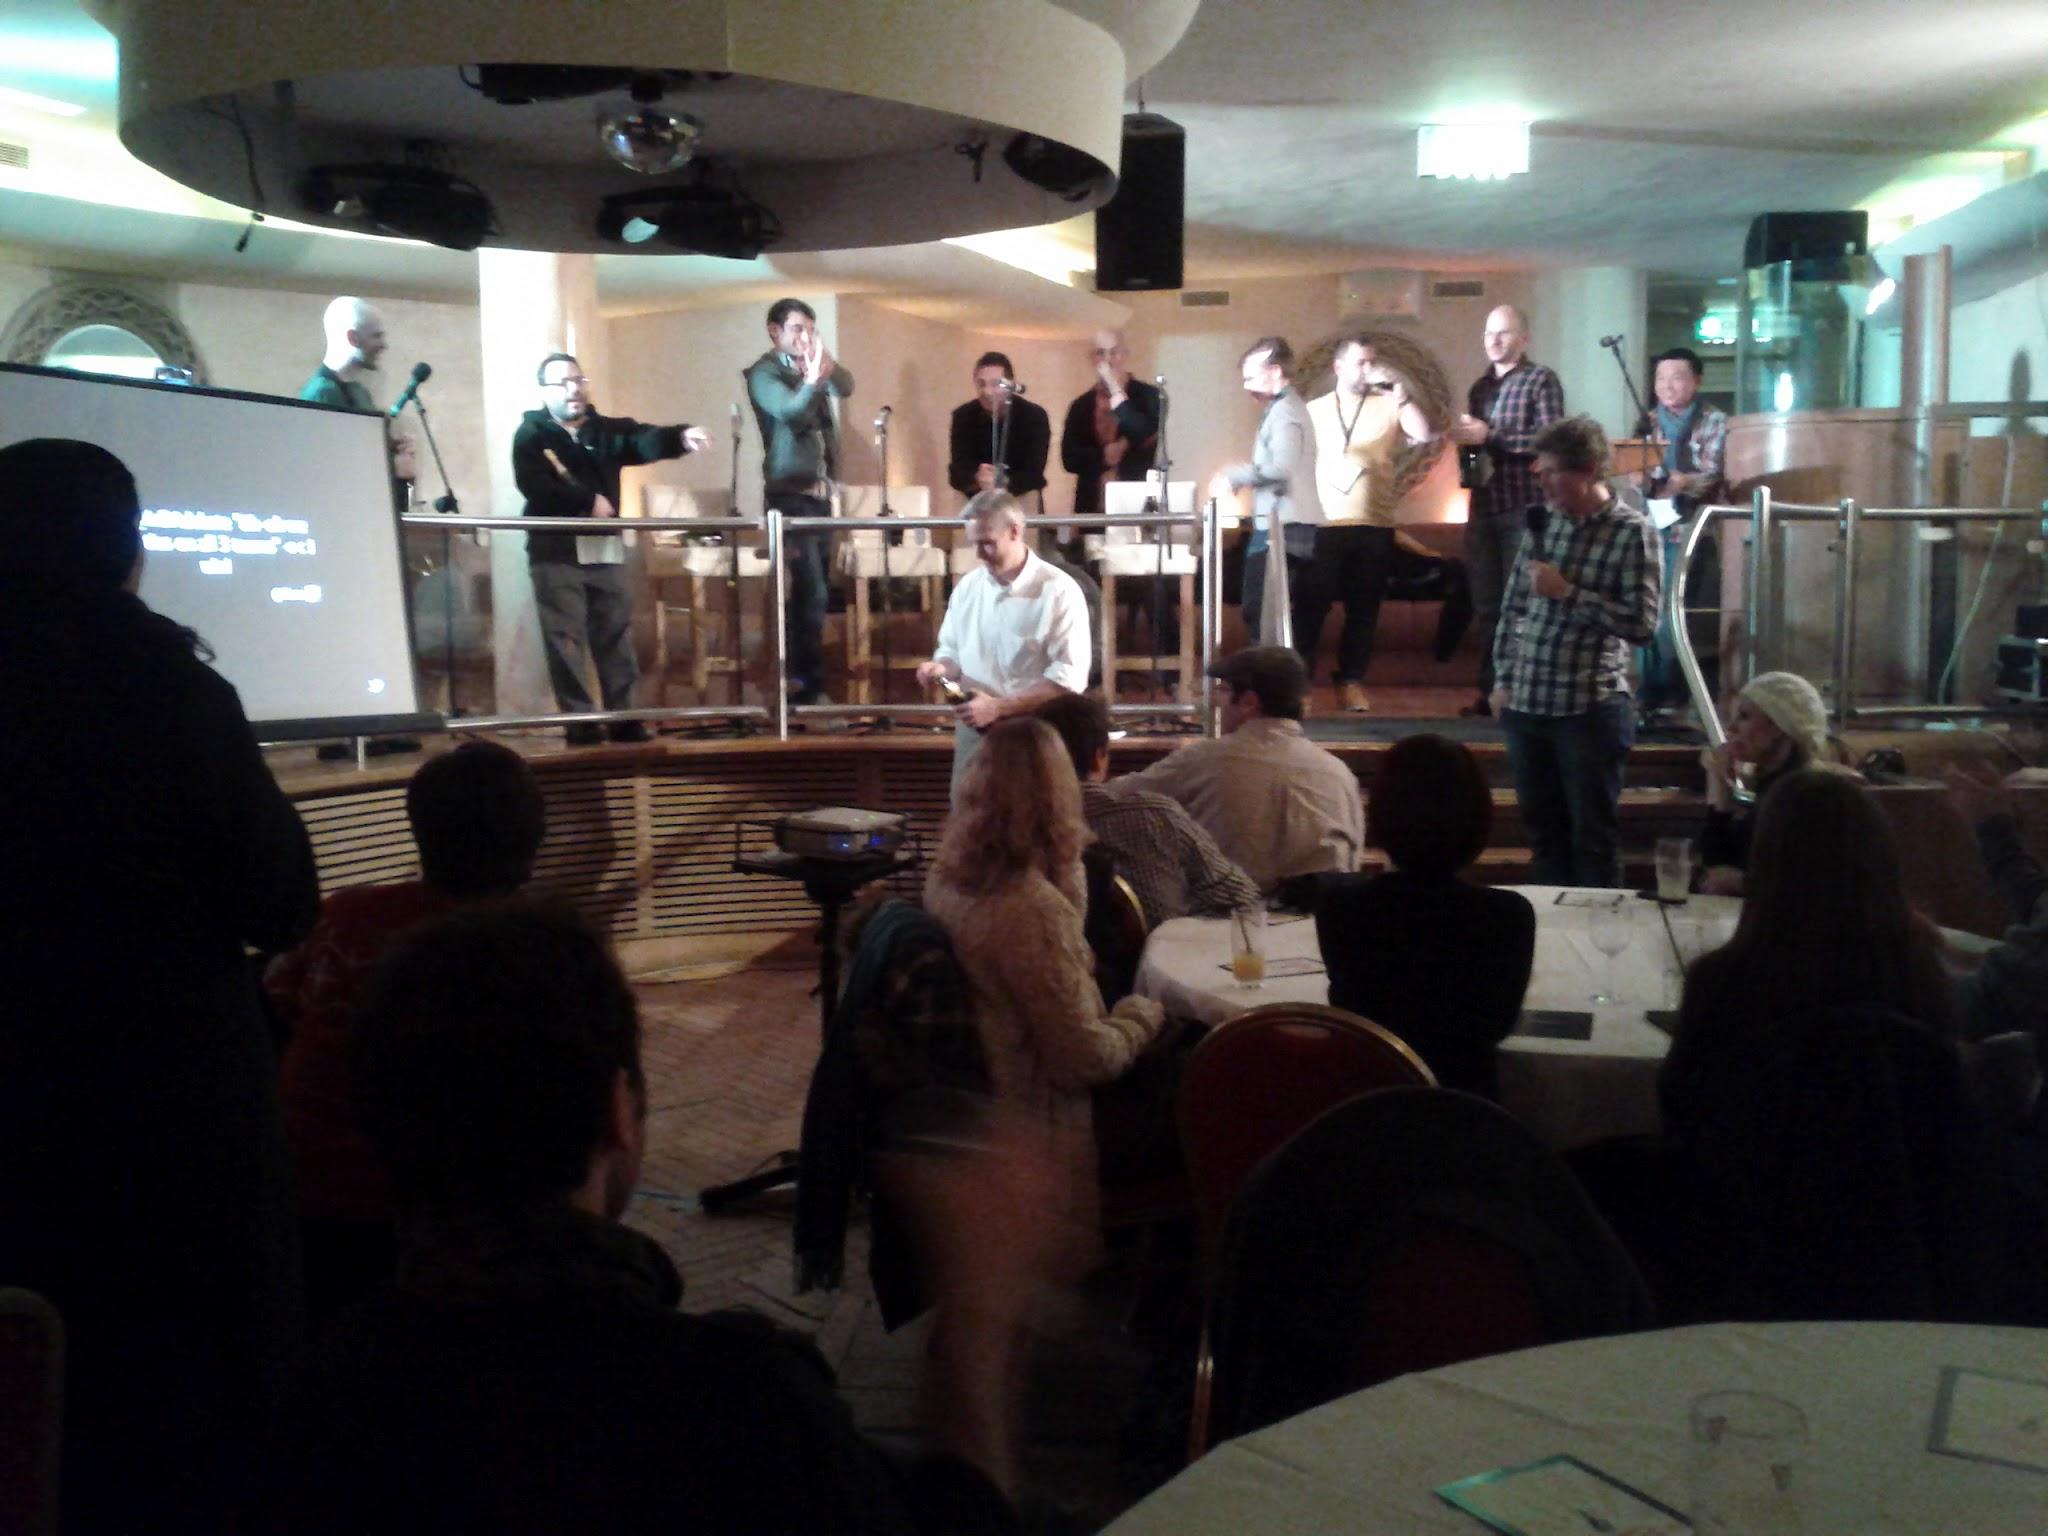 Photo: The Great IxDA Debate!